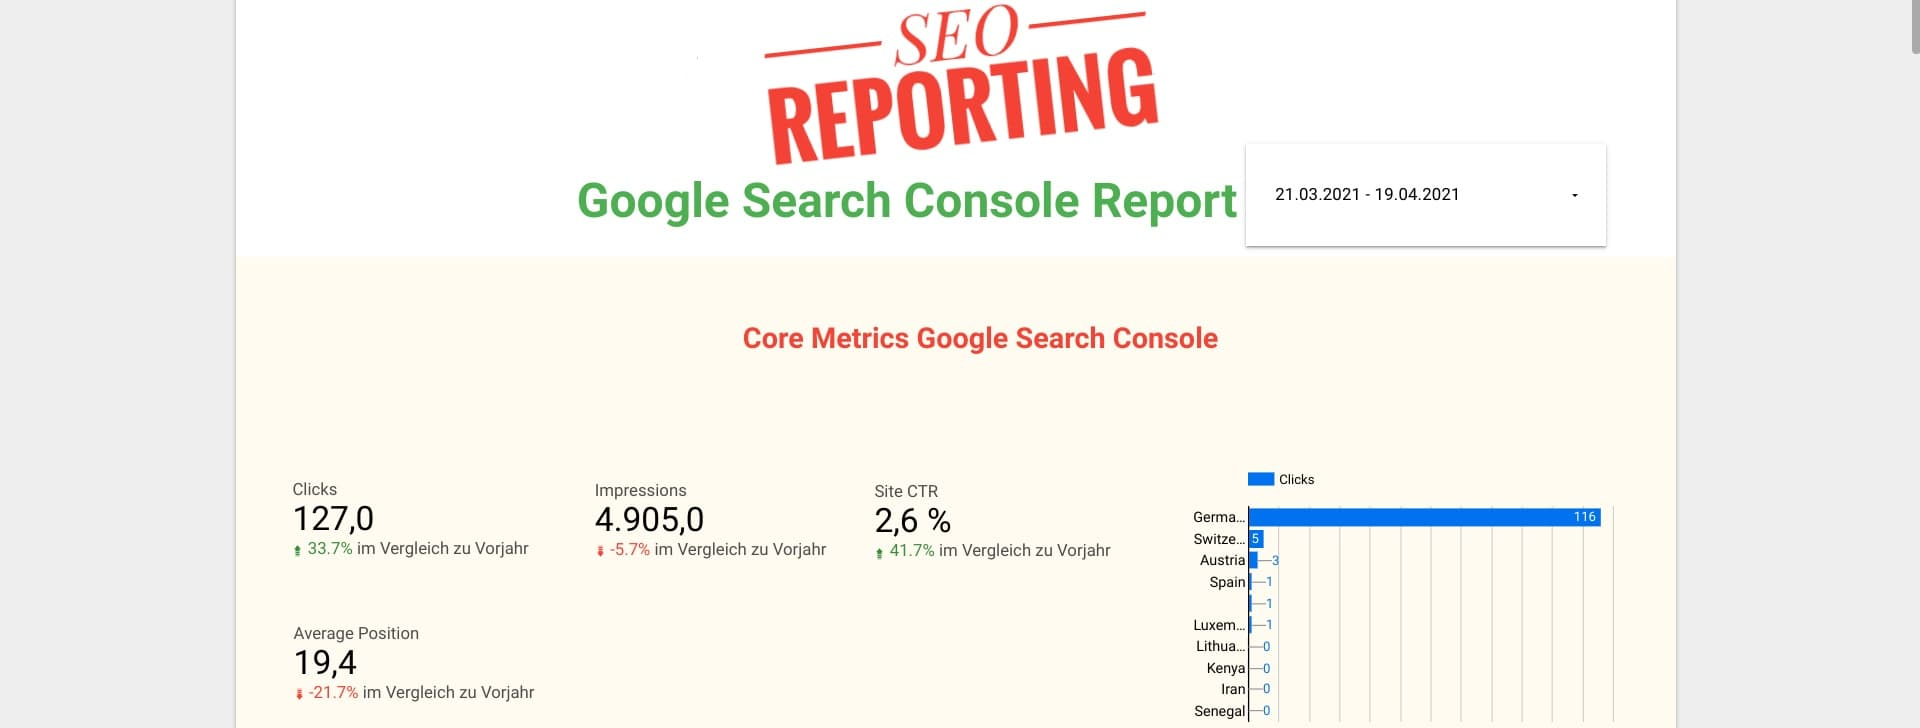 SEO-Reporting